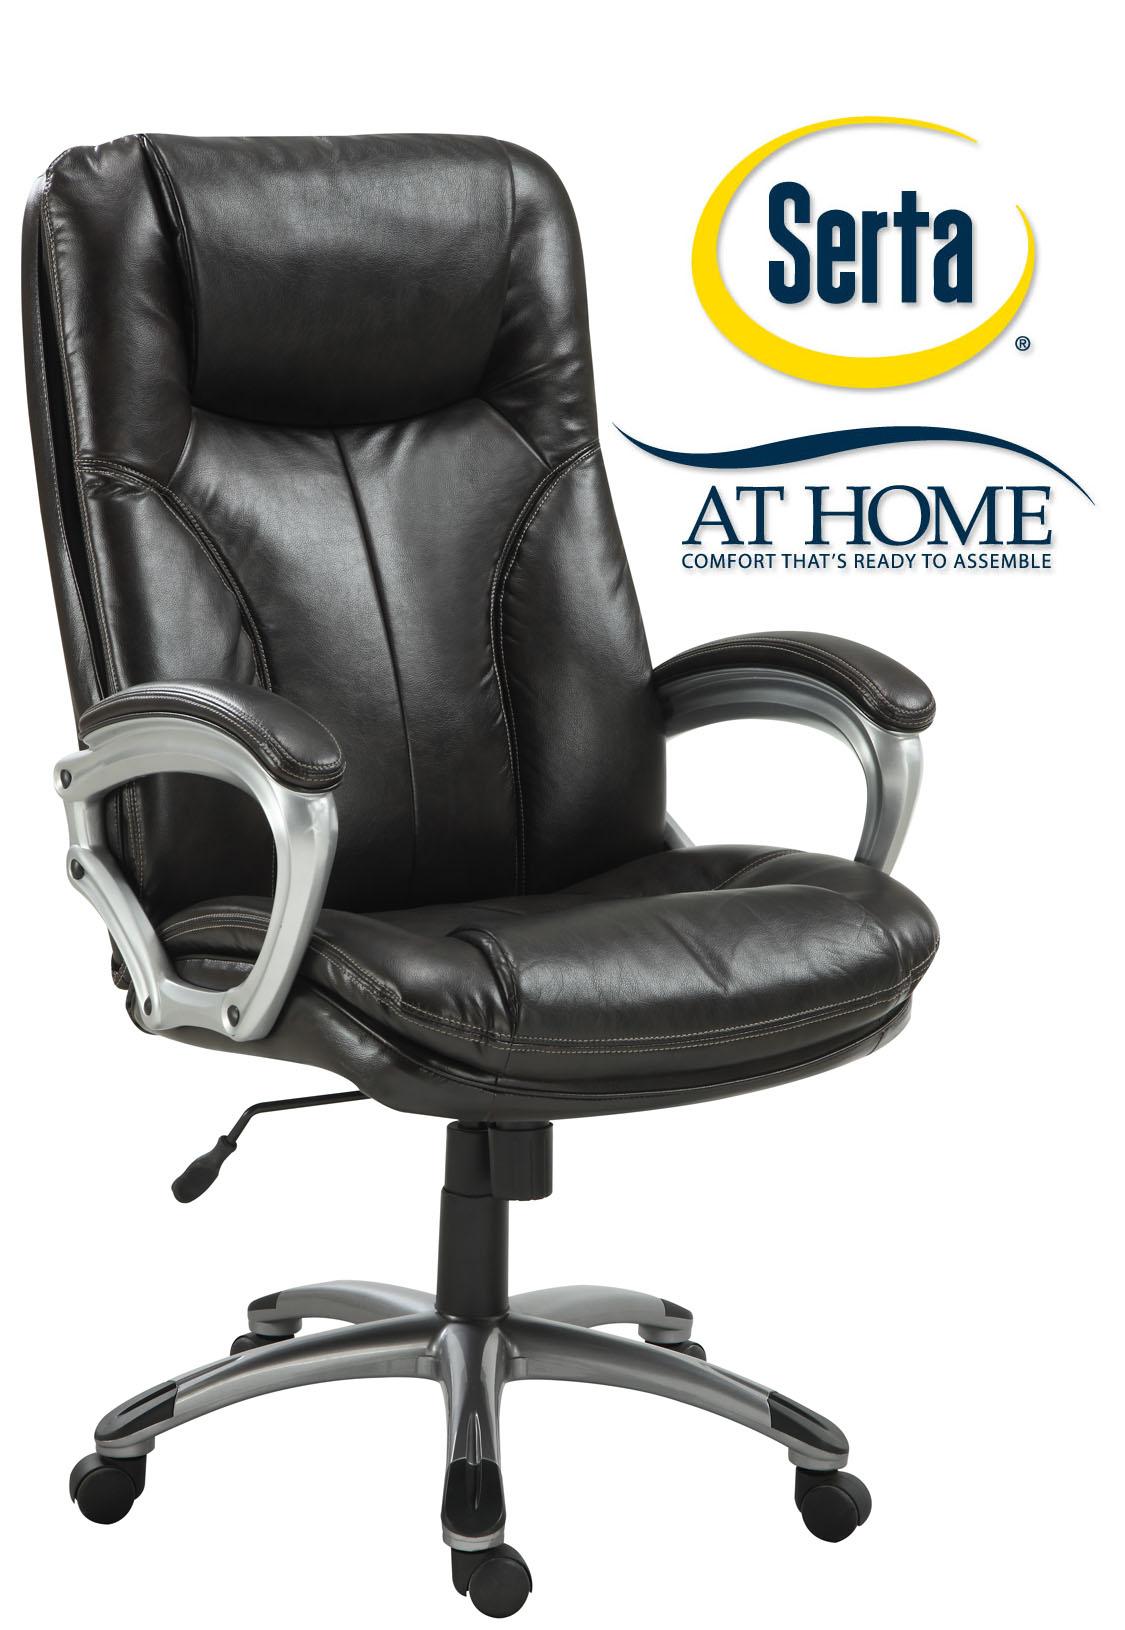 Serta Executive Big Amp Tall Office Chair